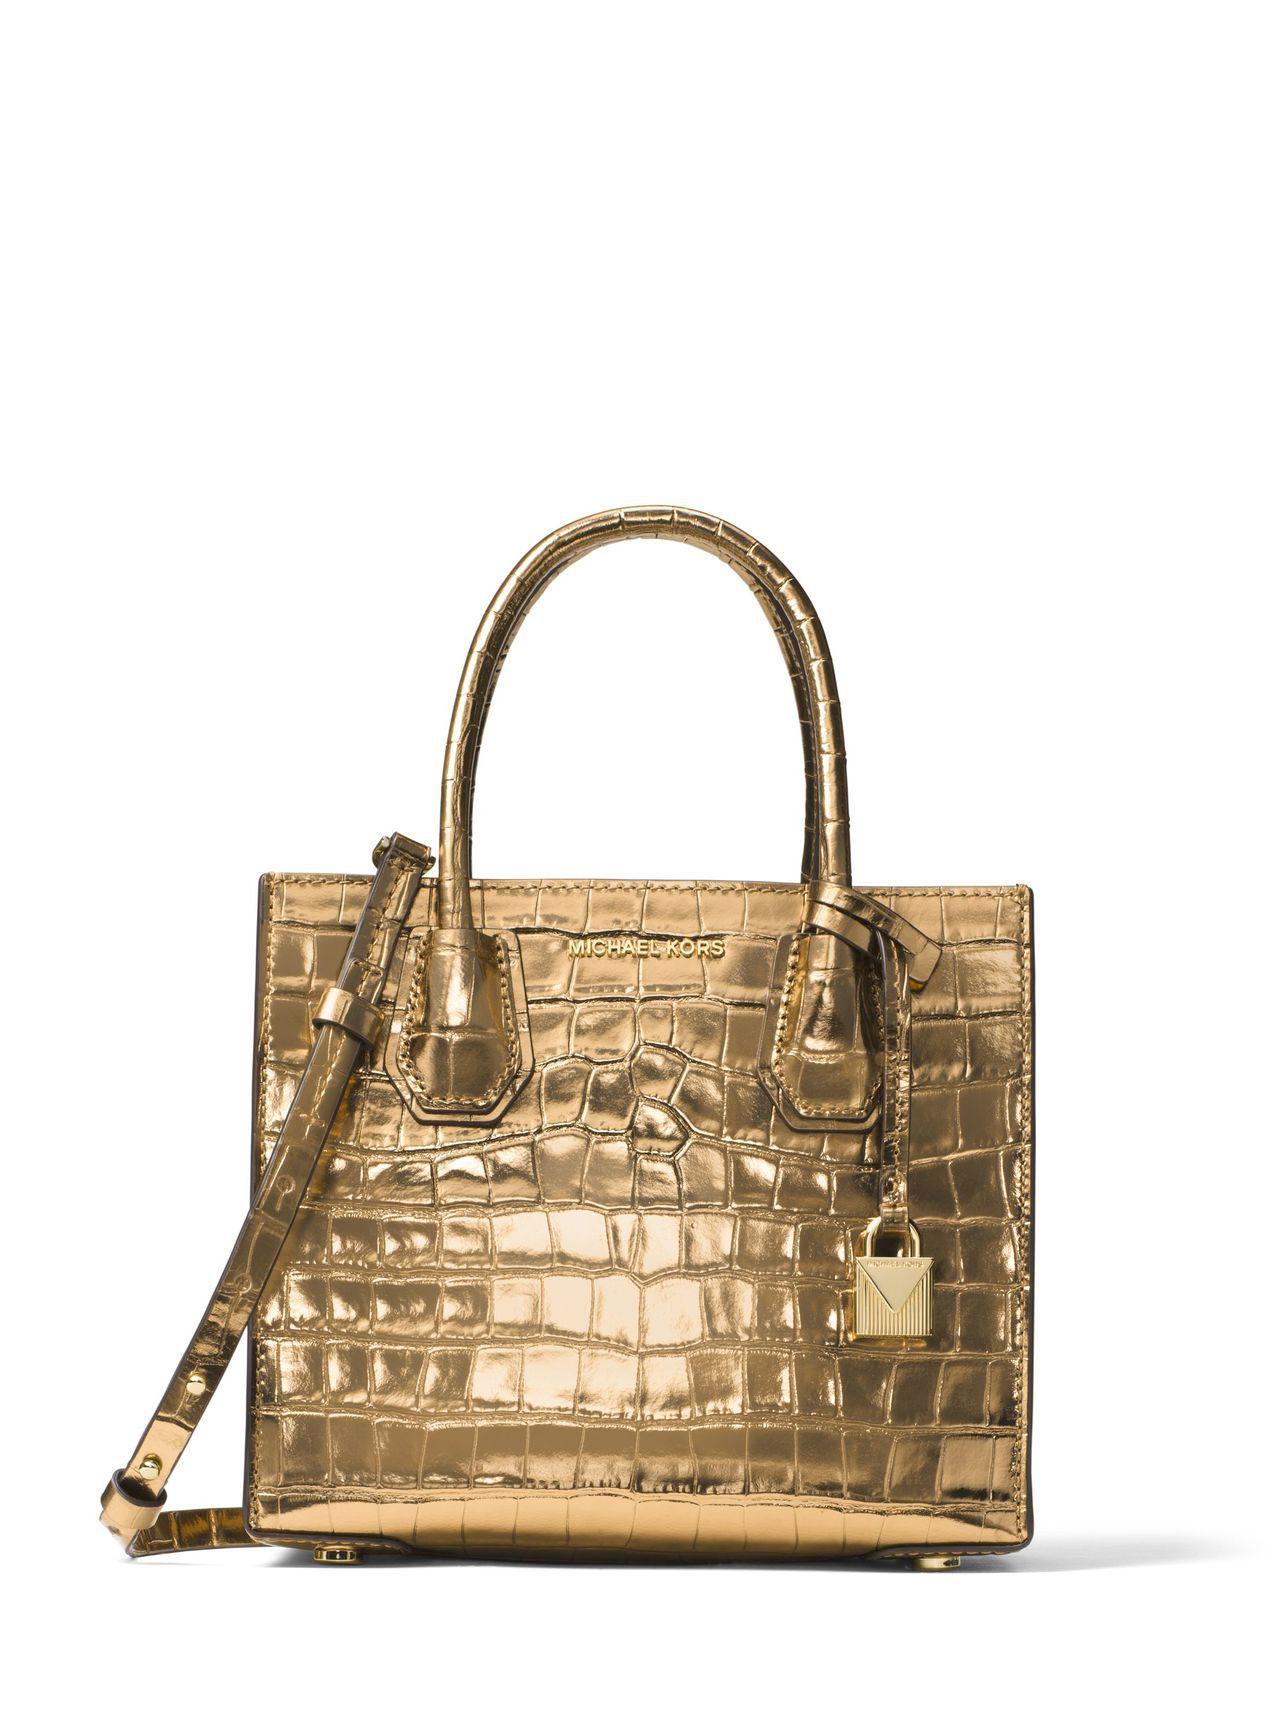 Mercer金色蛇紋小提包,售價17,800元。圖/MICHAEL KORS提供